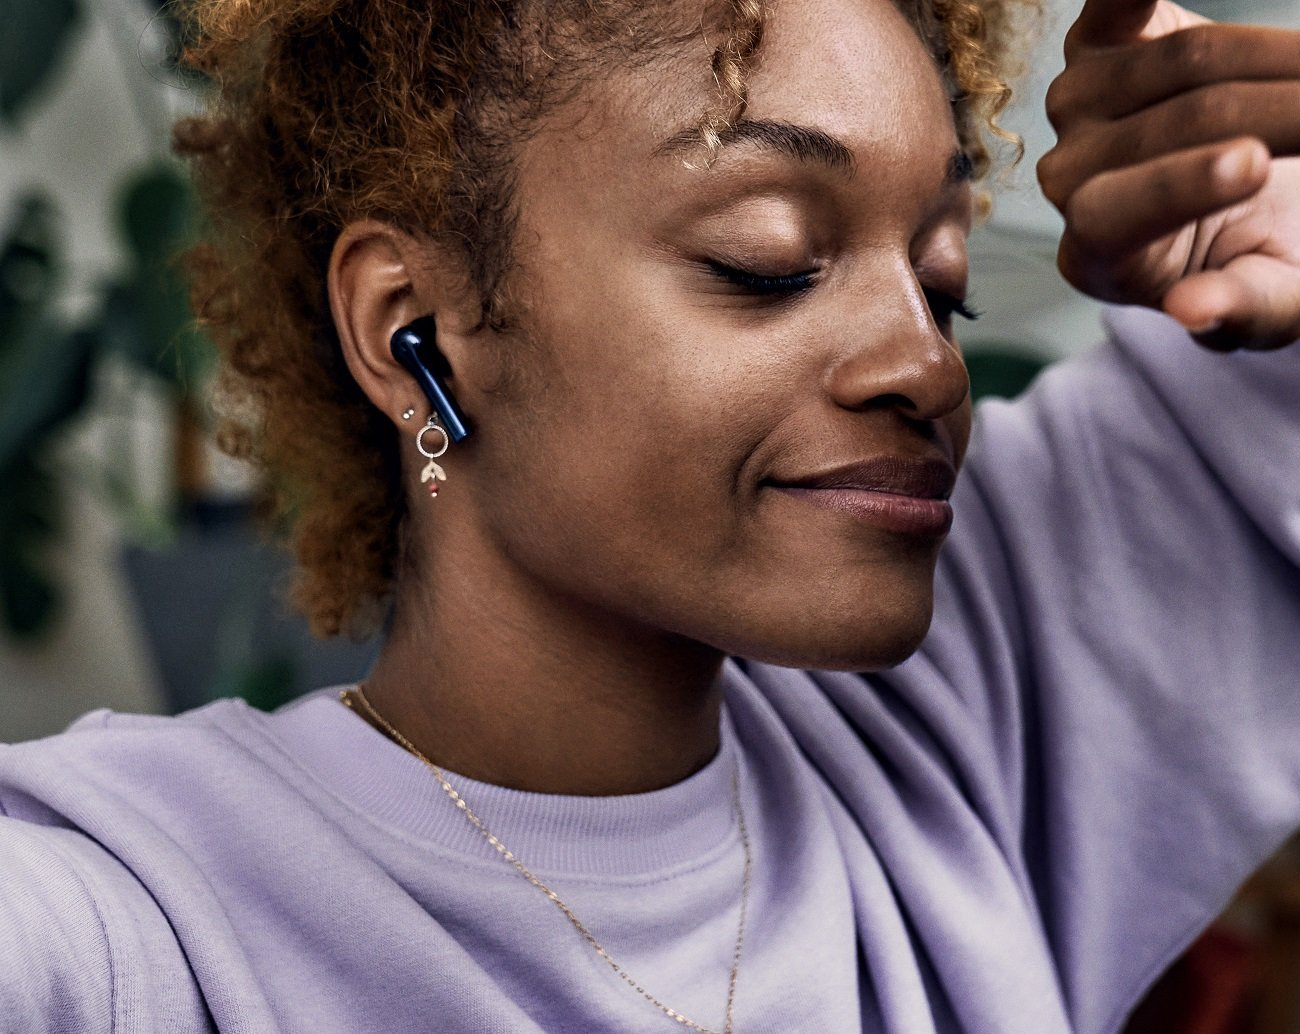 TWS Neo : Vivo lance ses premiers écouteurs true wireless aptX HD en France